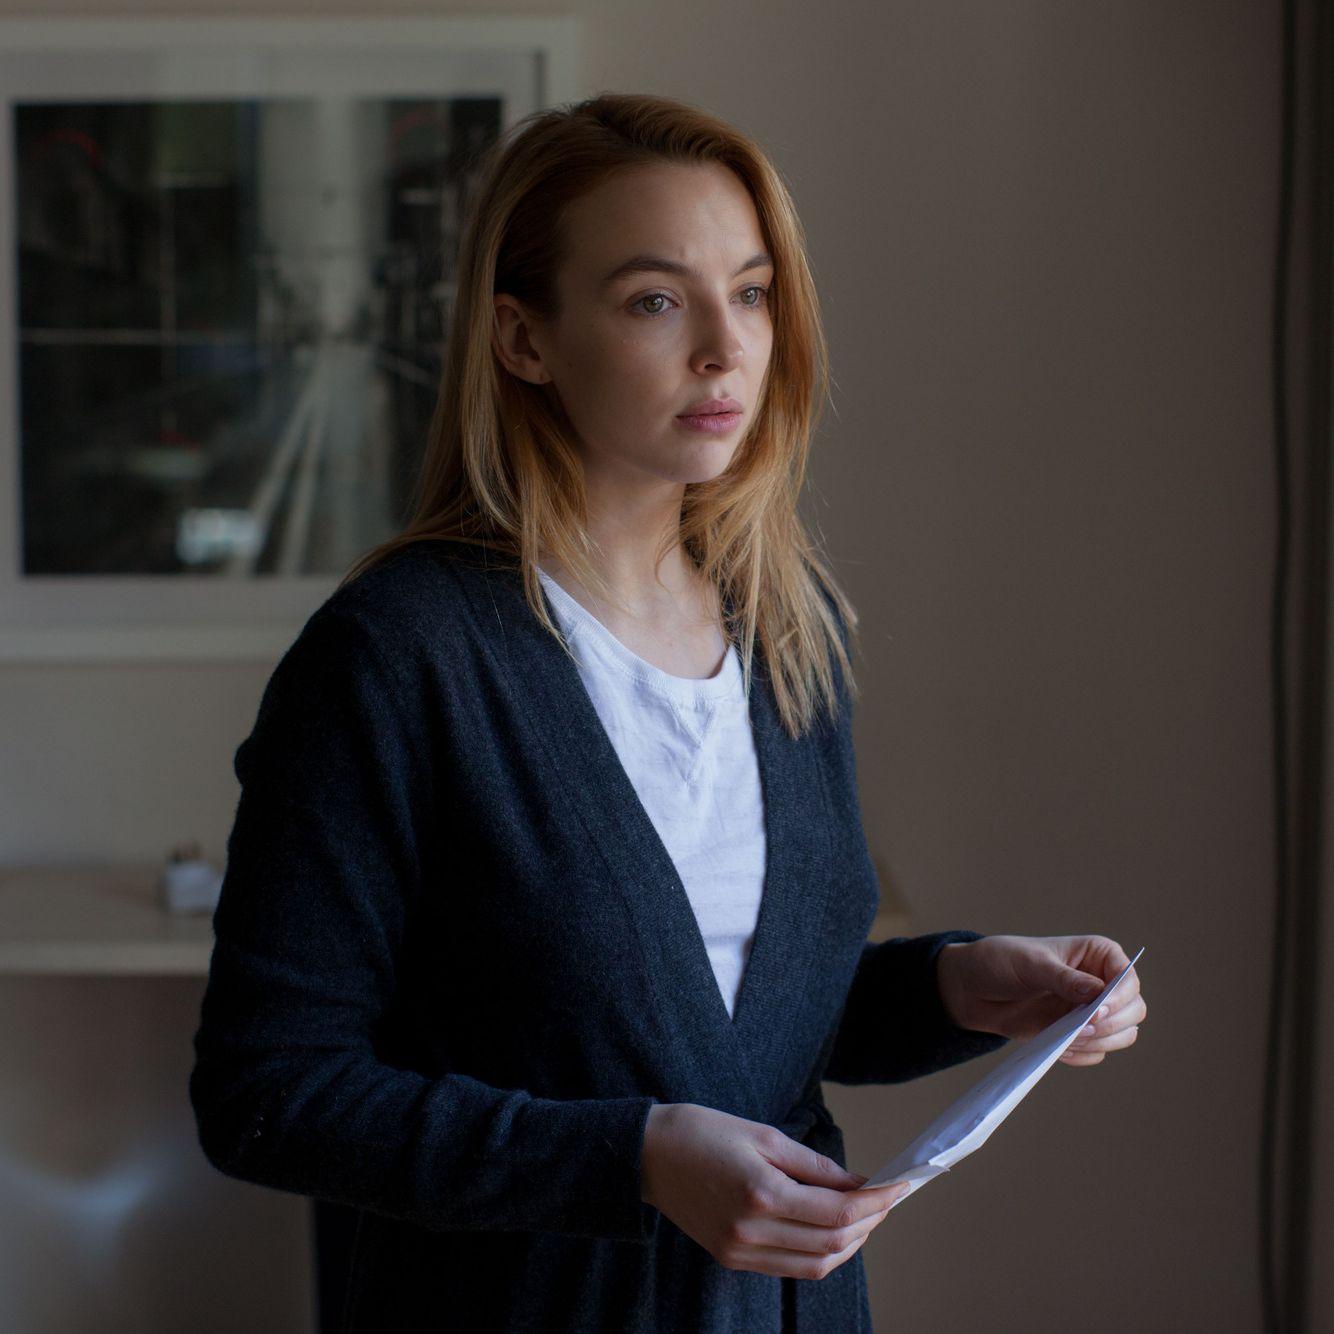 Killing Eve's Jodie Comer recalls disturbingly bizarre fan request